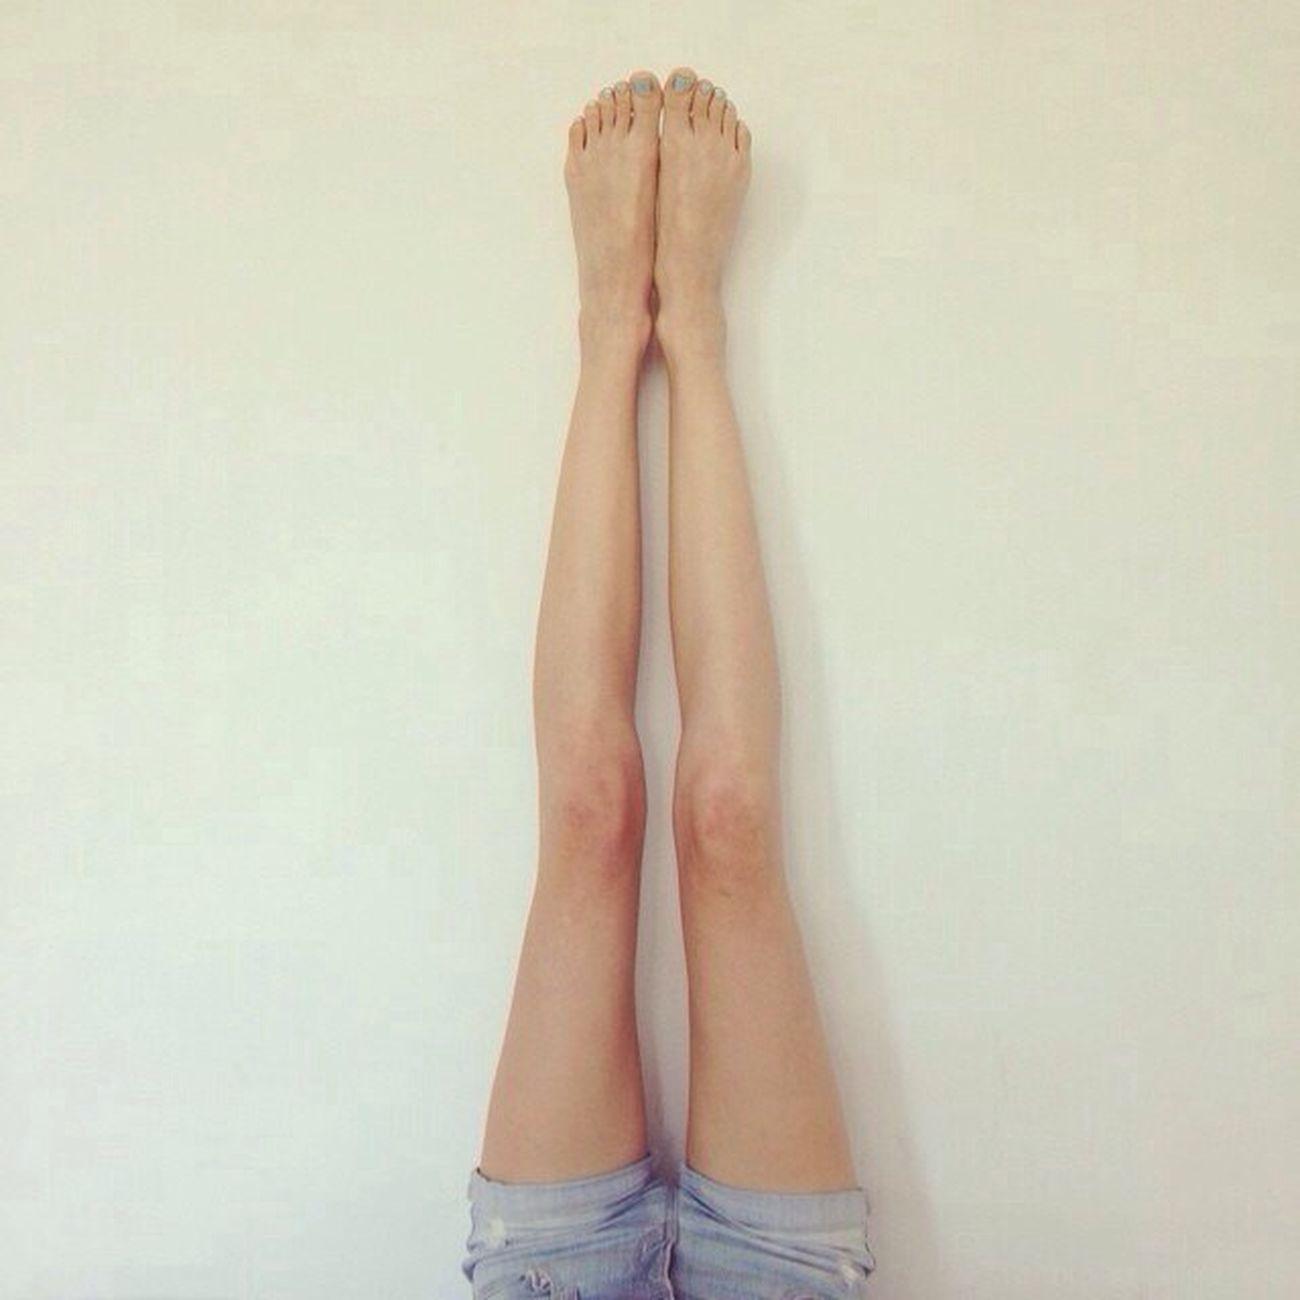 Legs Good Times Skinny That's Me